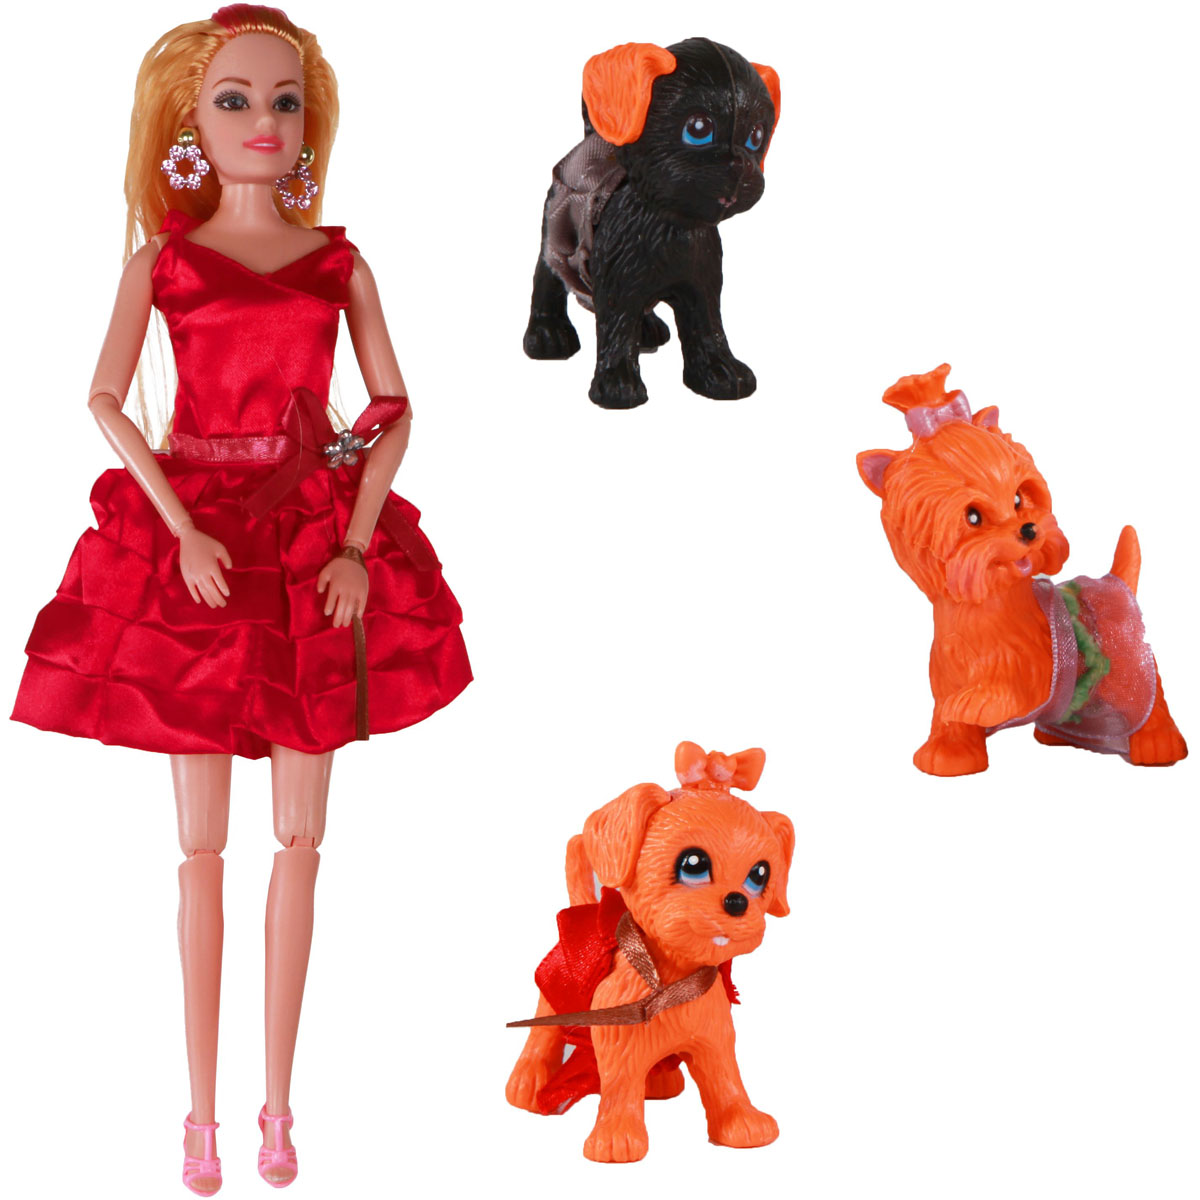 Yako Кукла Жанетт и забавные друзья M6583-5 кукла yako m6579 6